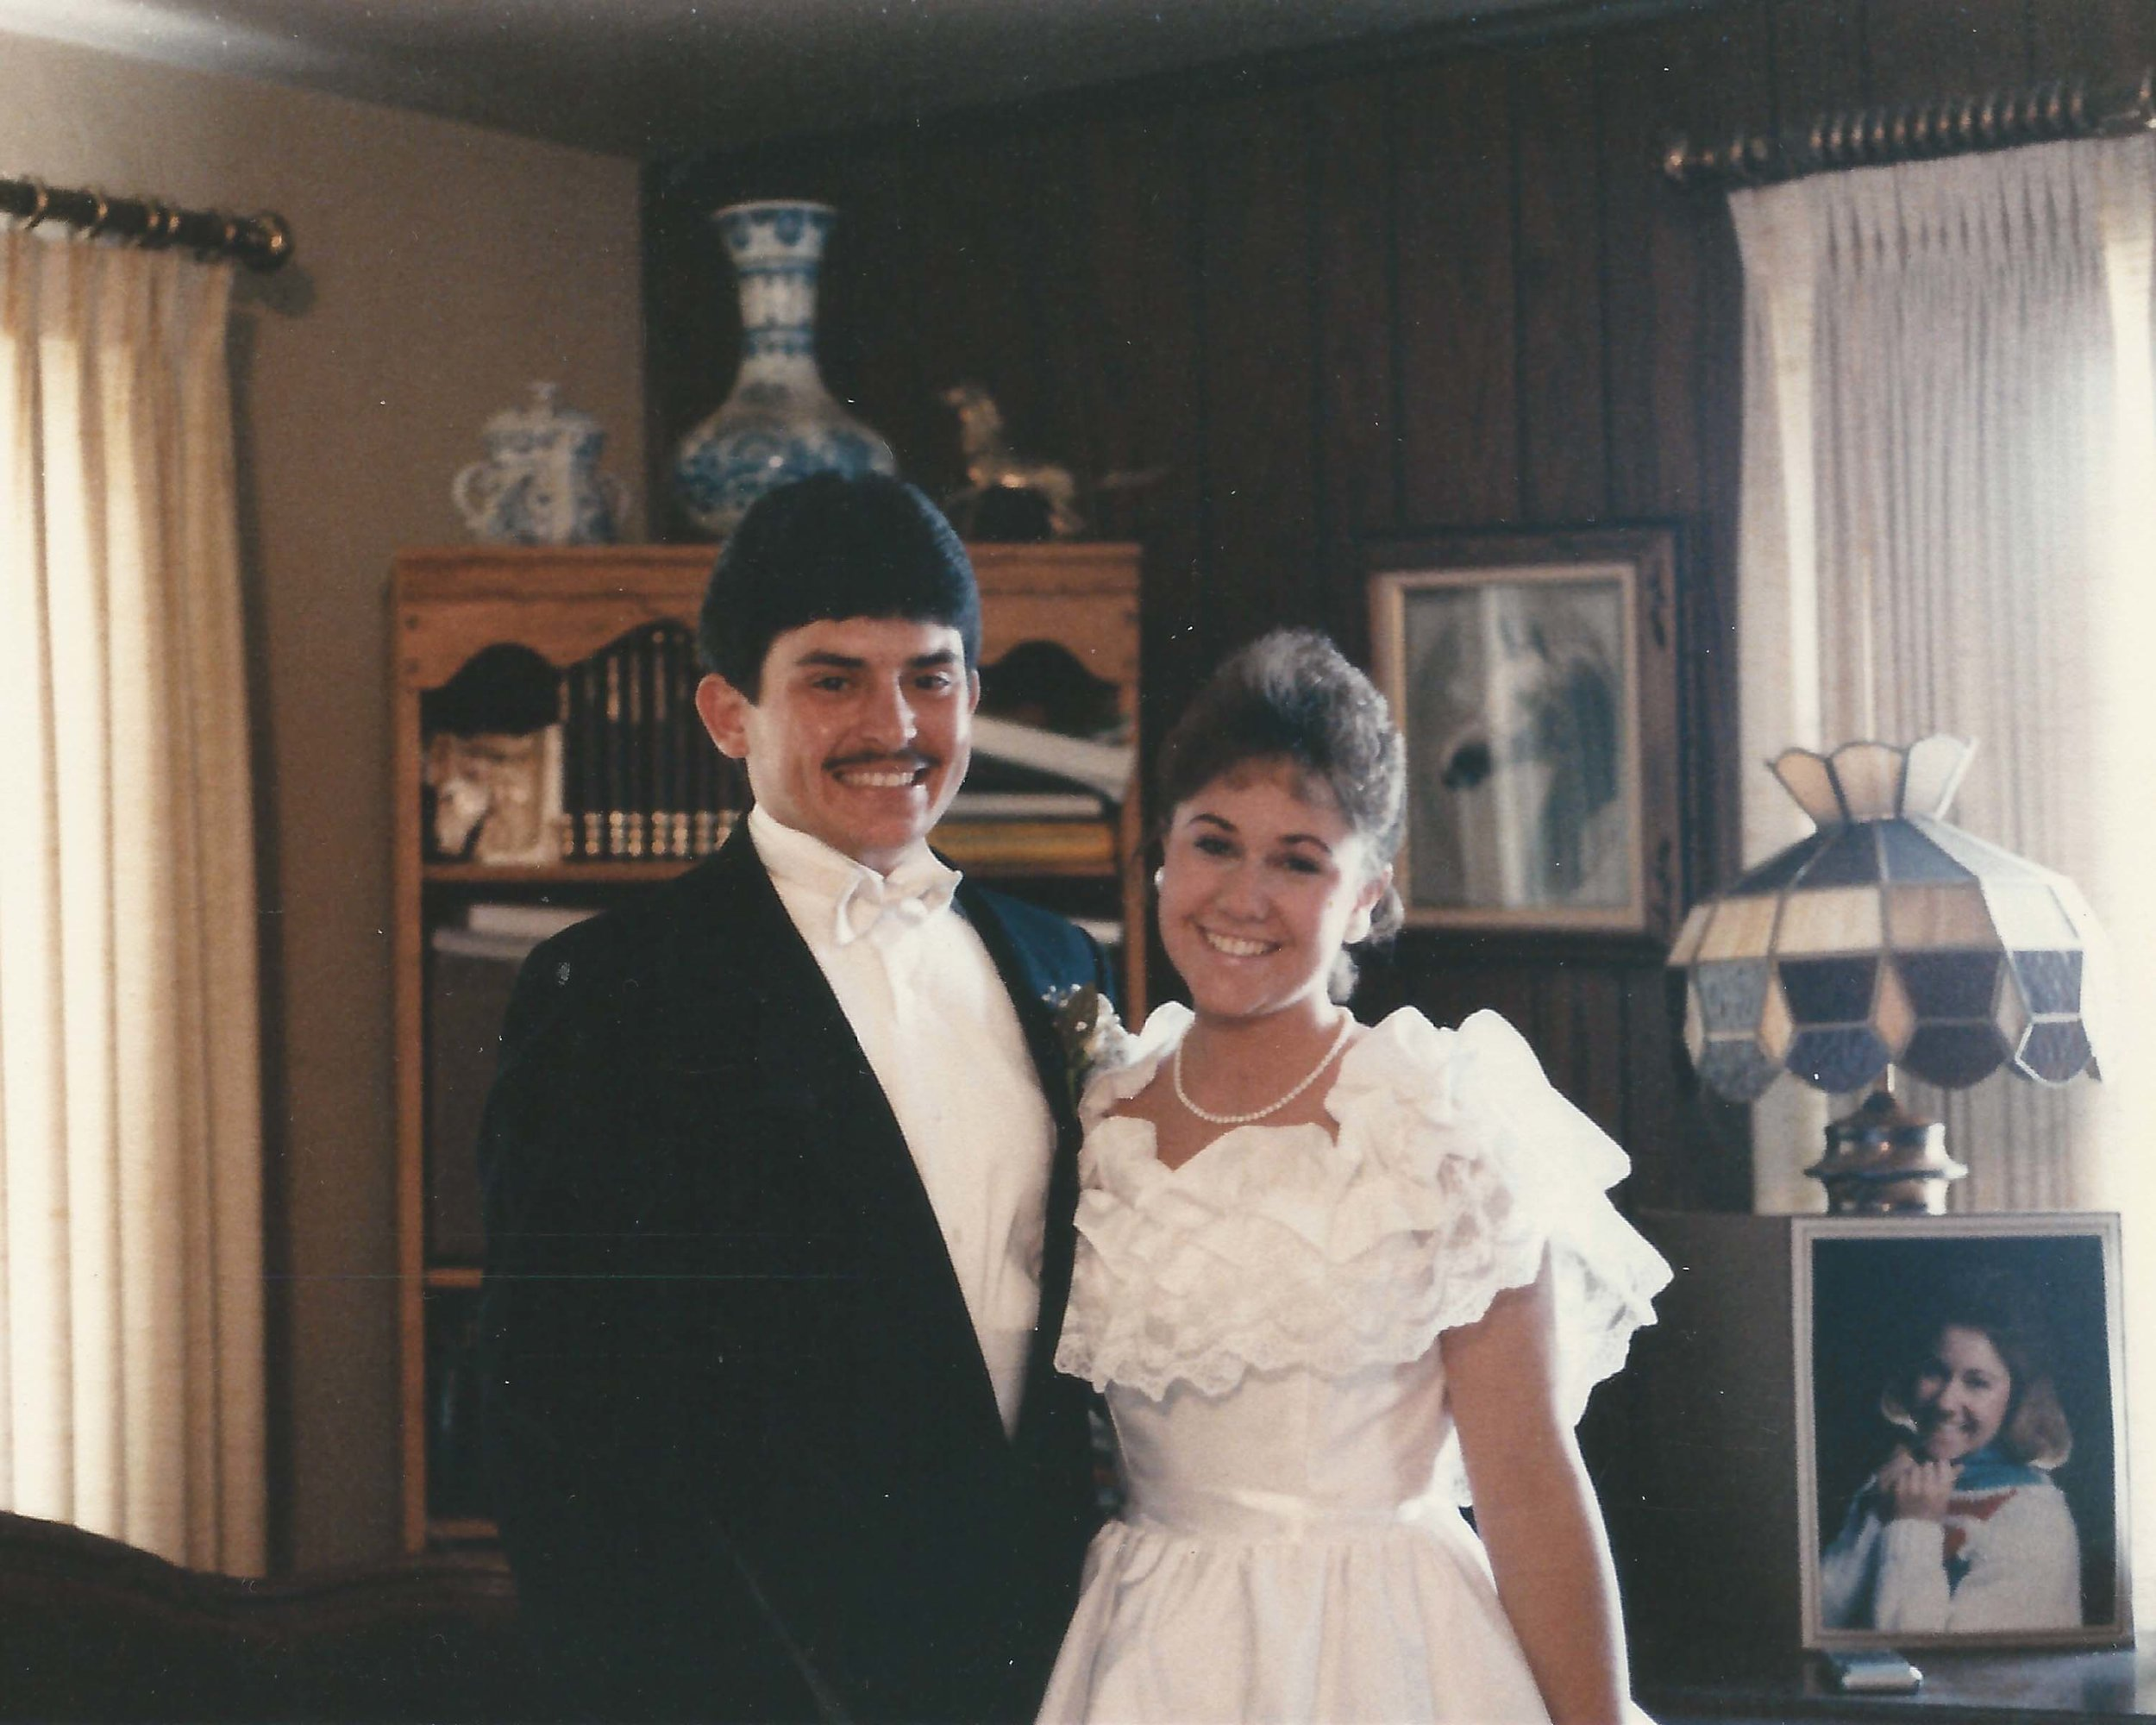 Senior-Prom-1986.jpg